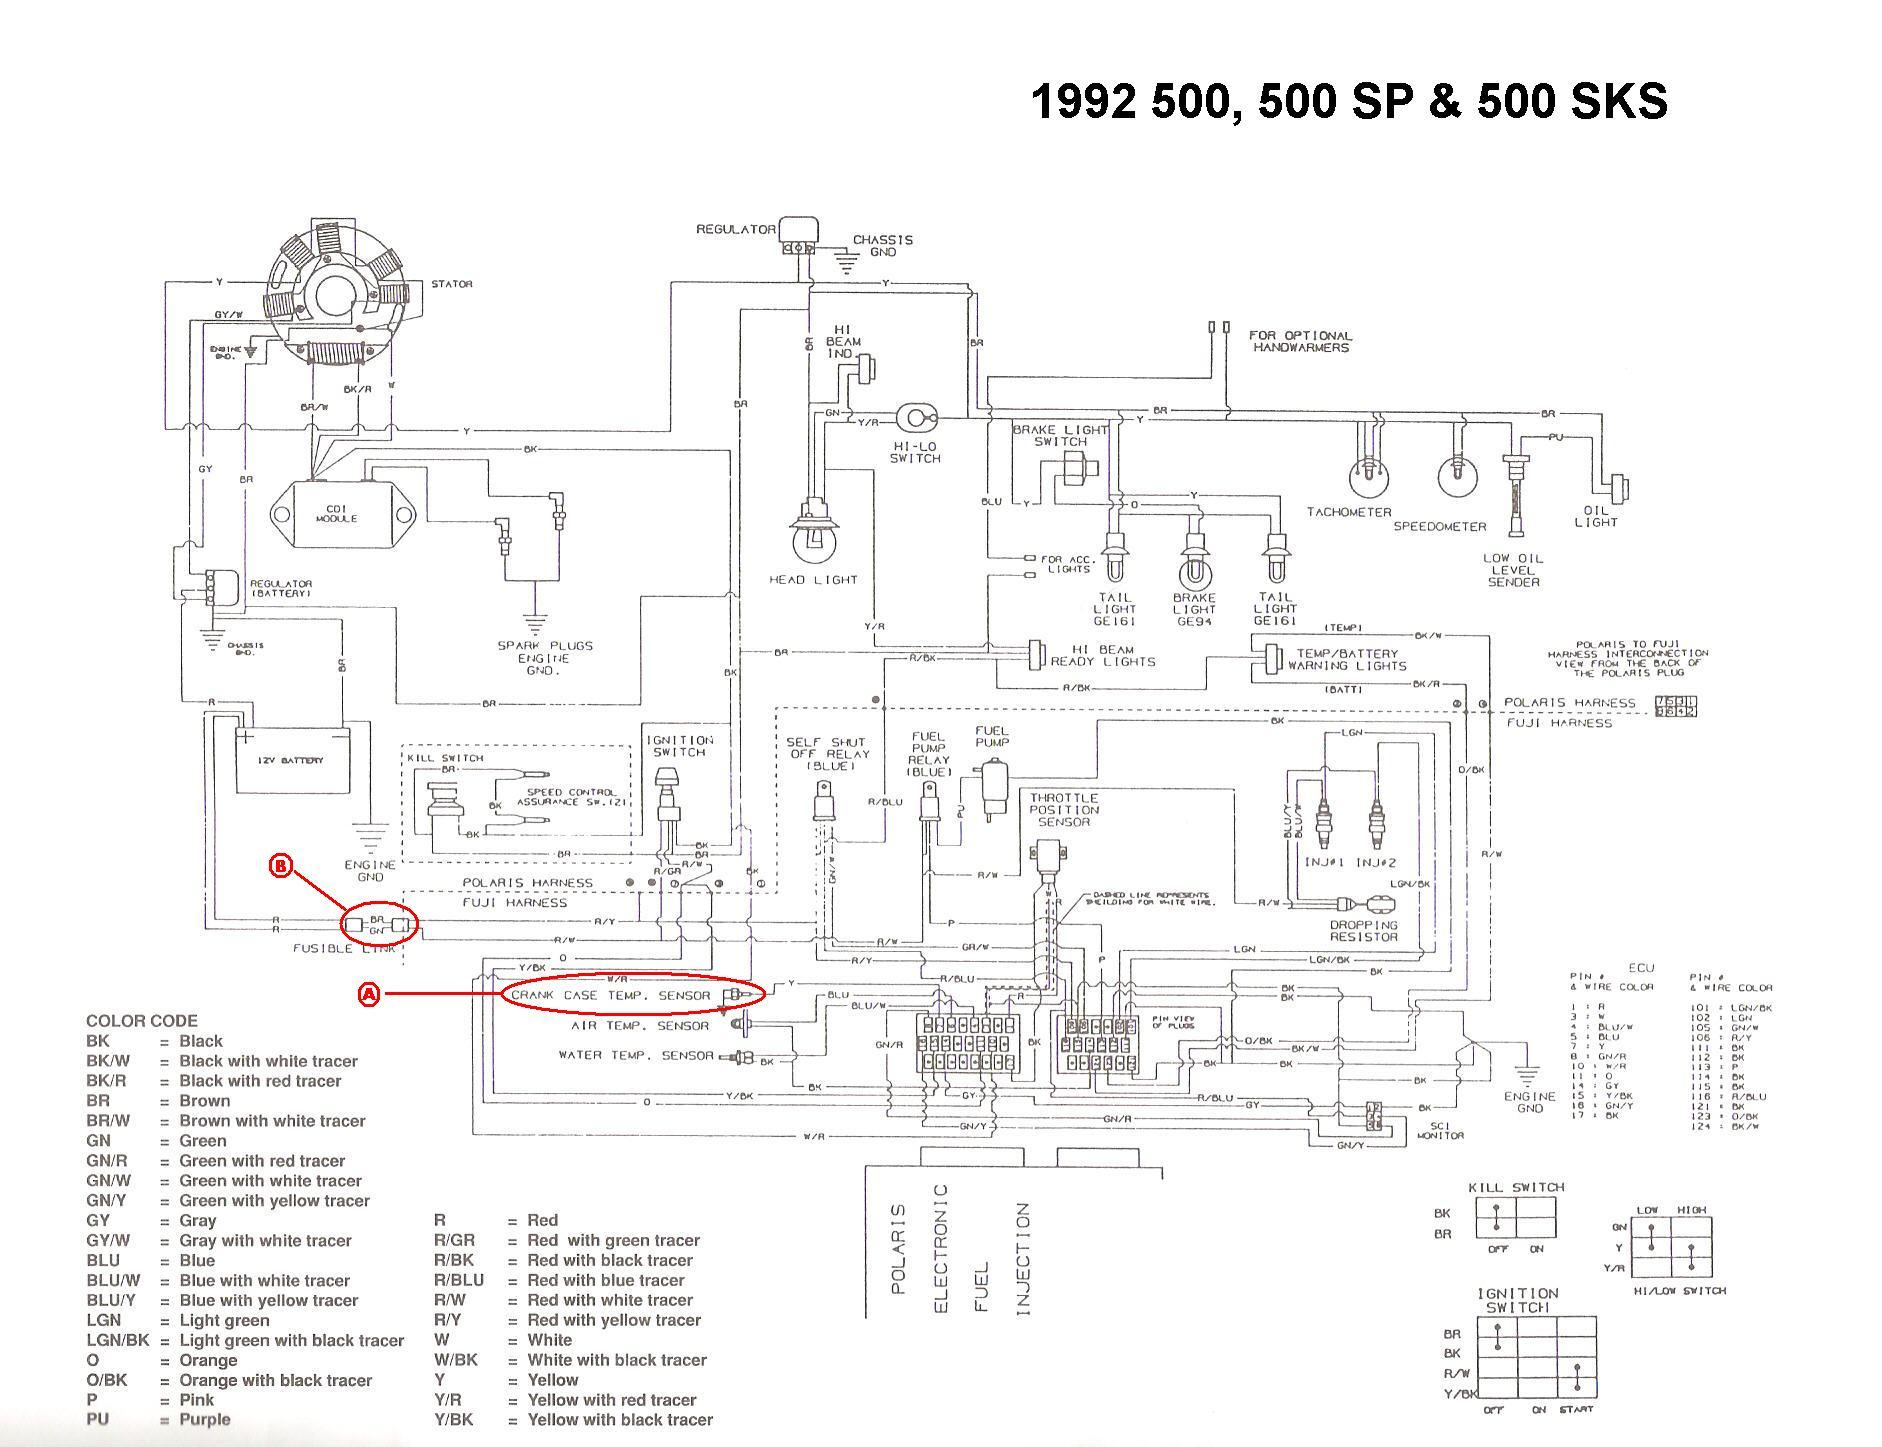 DN_3636] Wiring Diagram For 2000 Polaris Sportsman 500 Wiring DiagramRally Cajos Mohammedshrine Librar Wiring 101